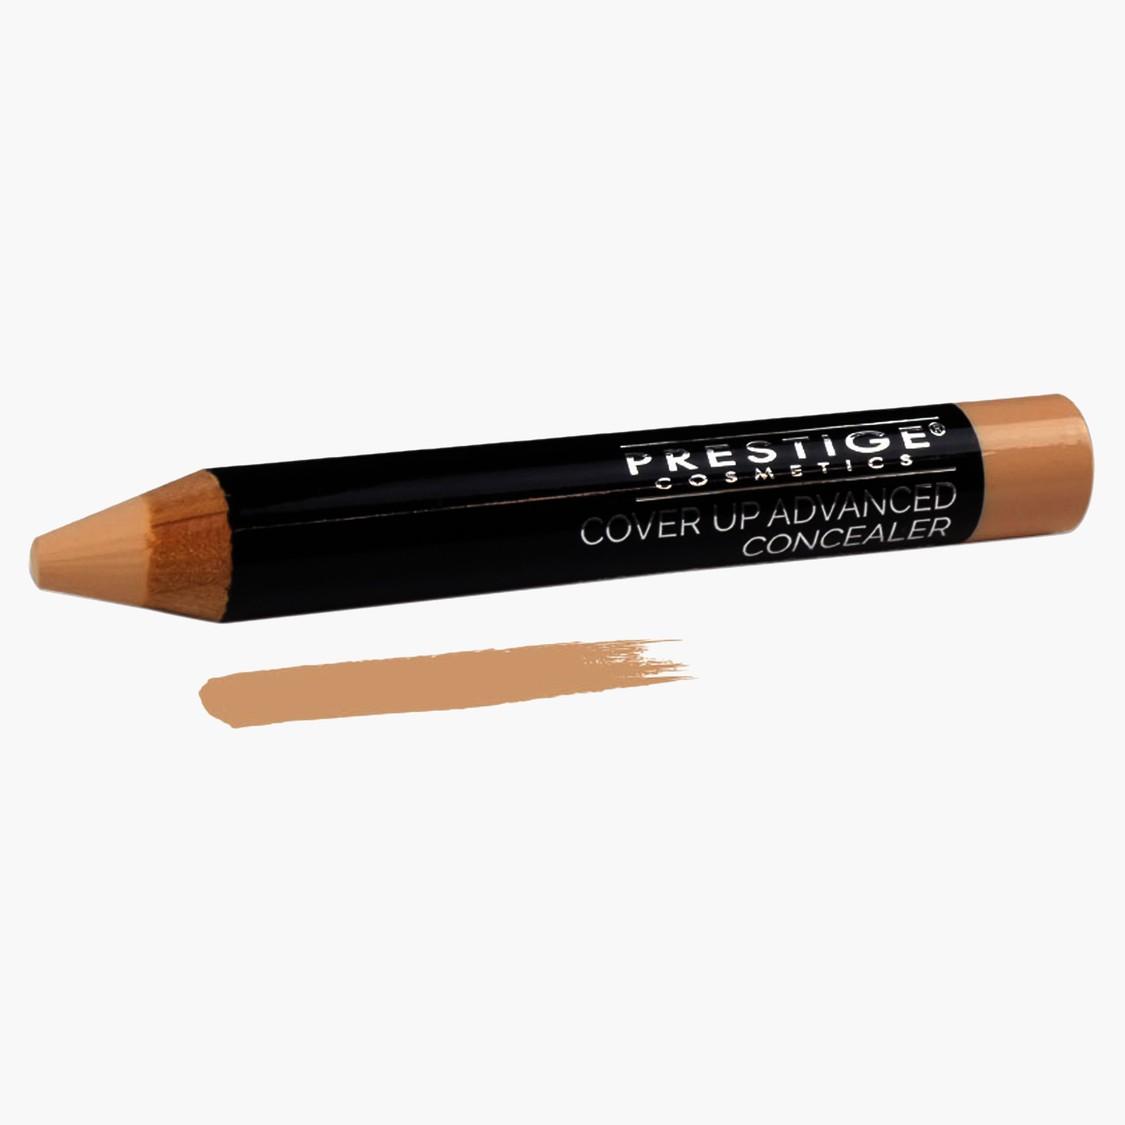 Prestige Cosmetics Cover Up Advanced Concealer